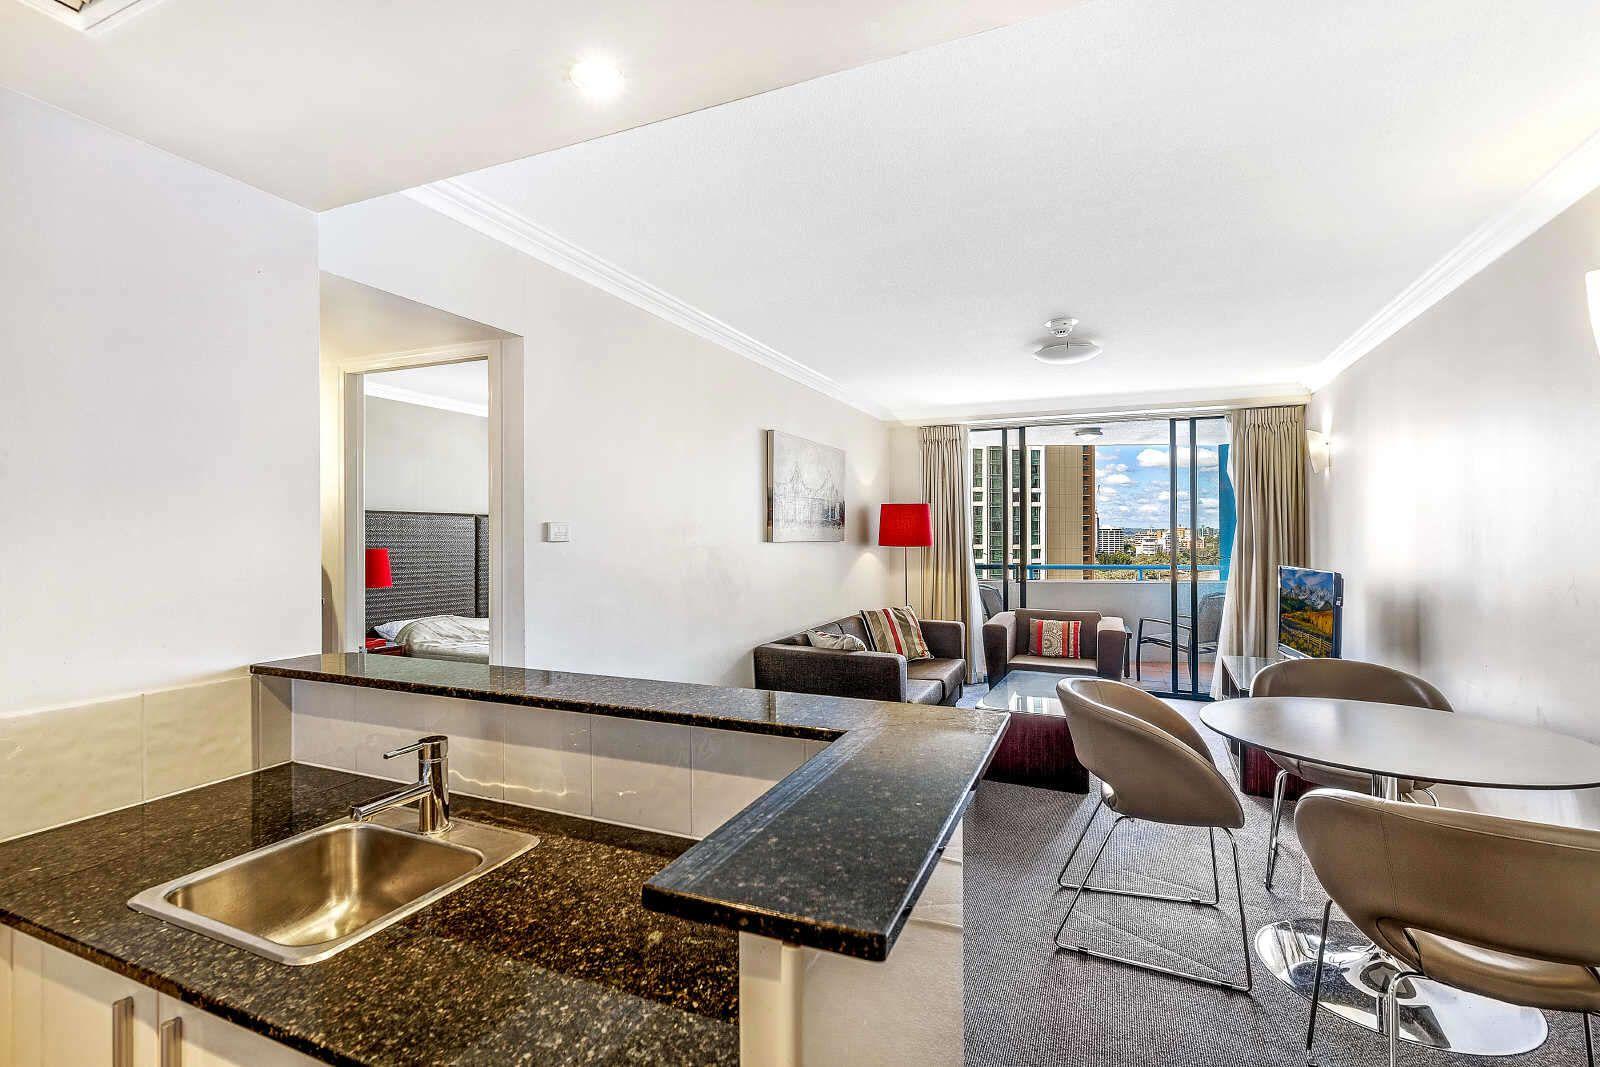 2807 Mantra on Queen 570 Queen Street, Brisbane City QLD 4000, Image 1